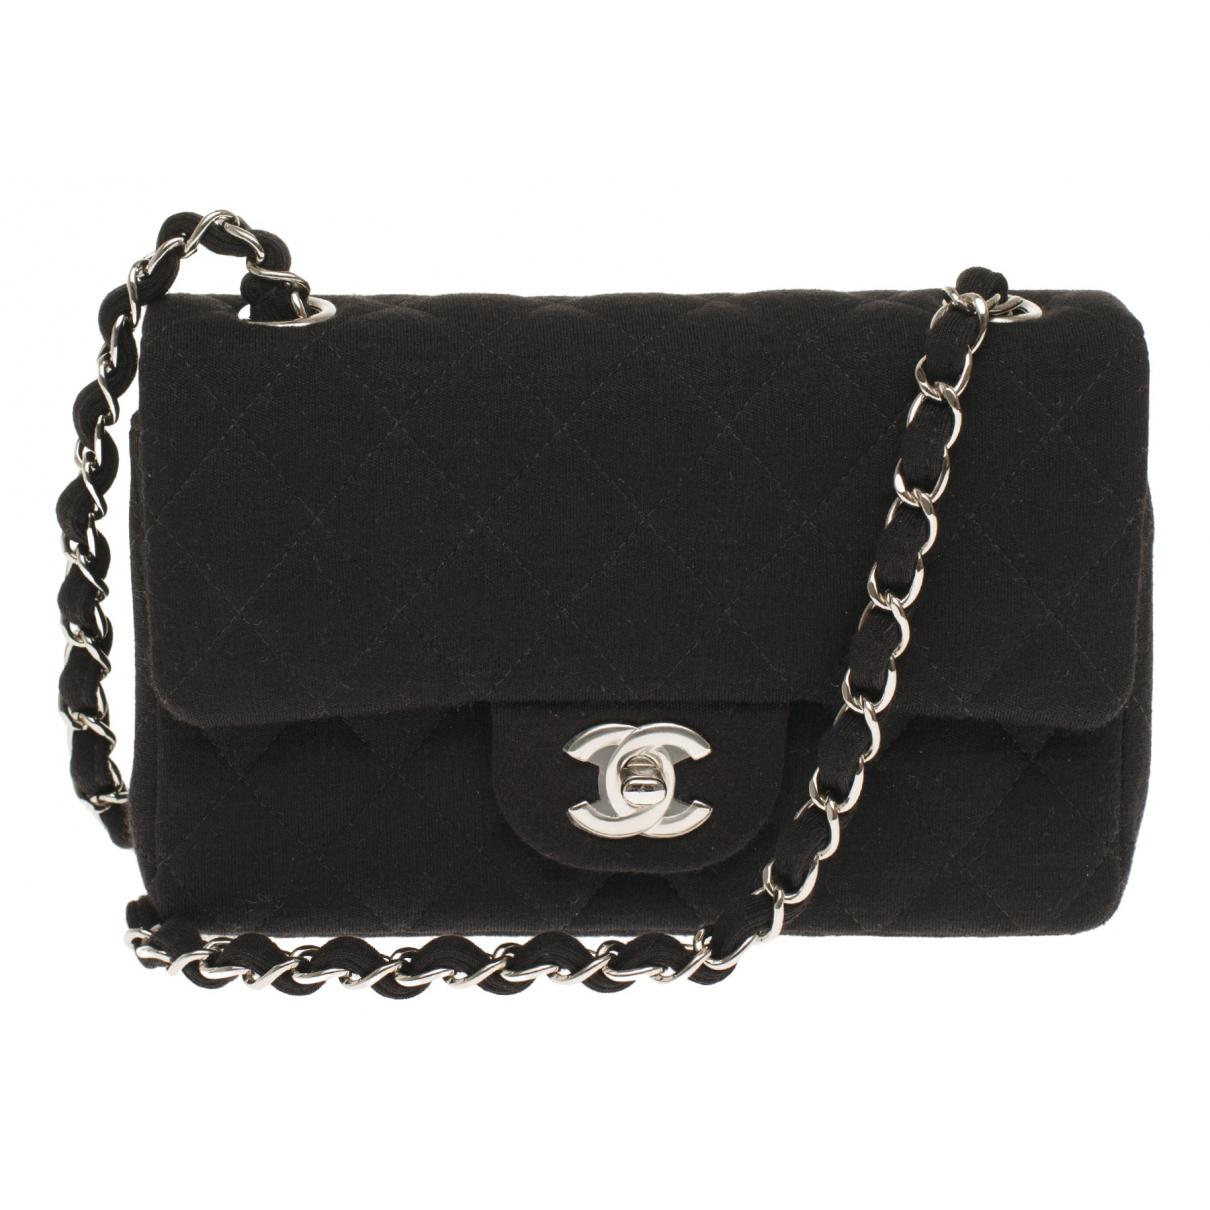 Chanel Timeless/Classique Black Cloth handbag for Women N